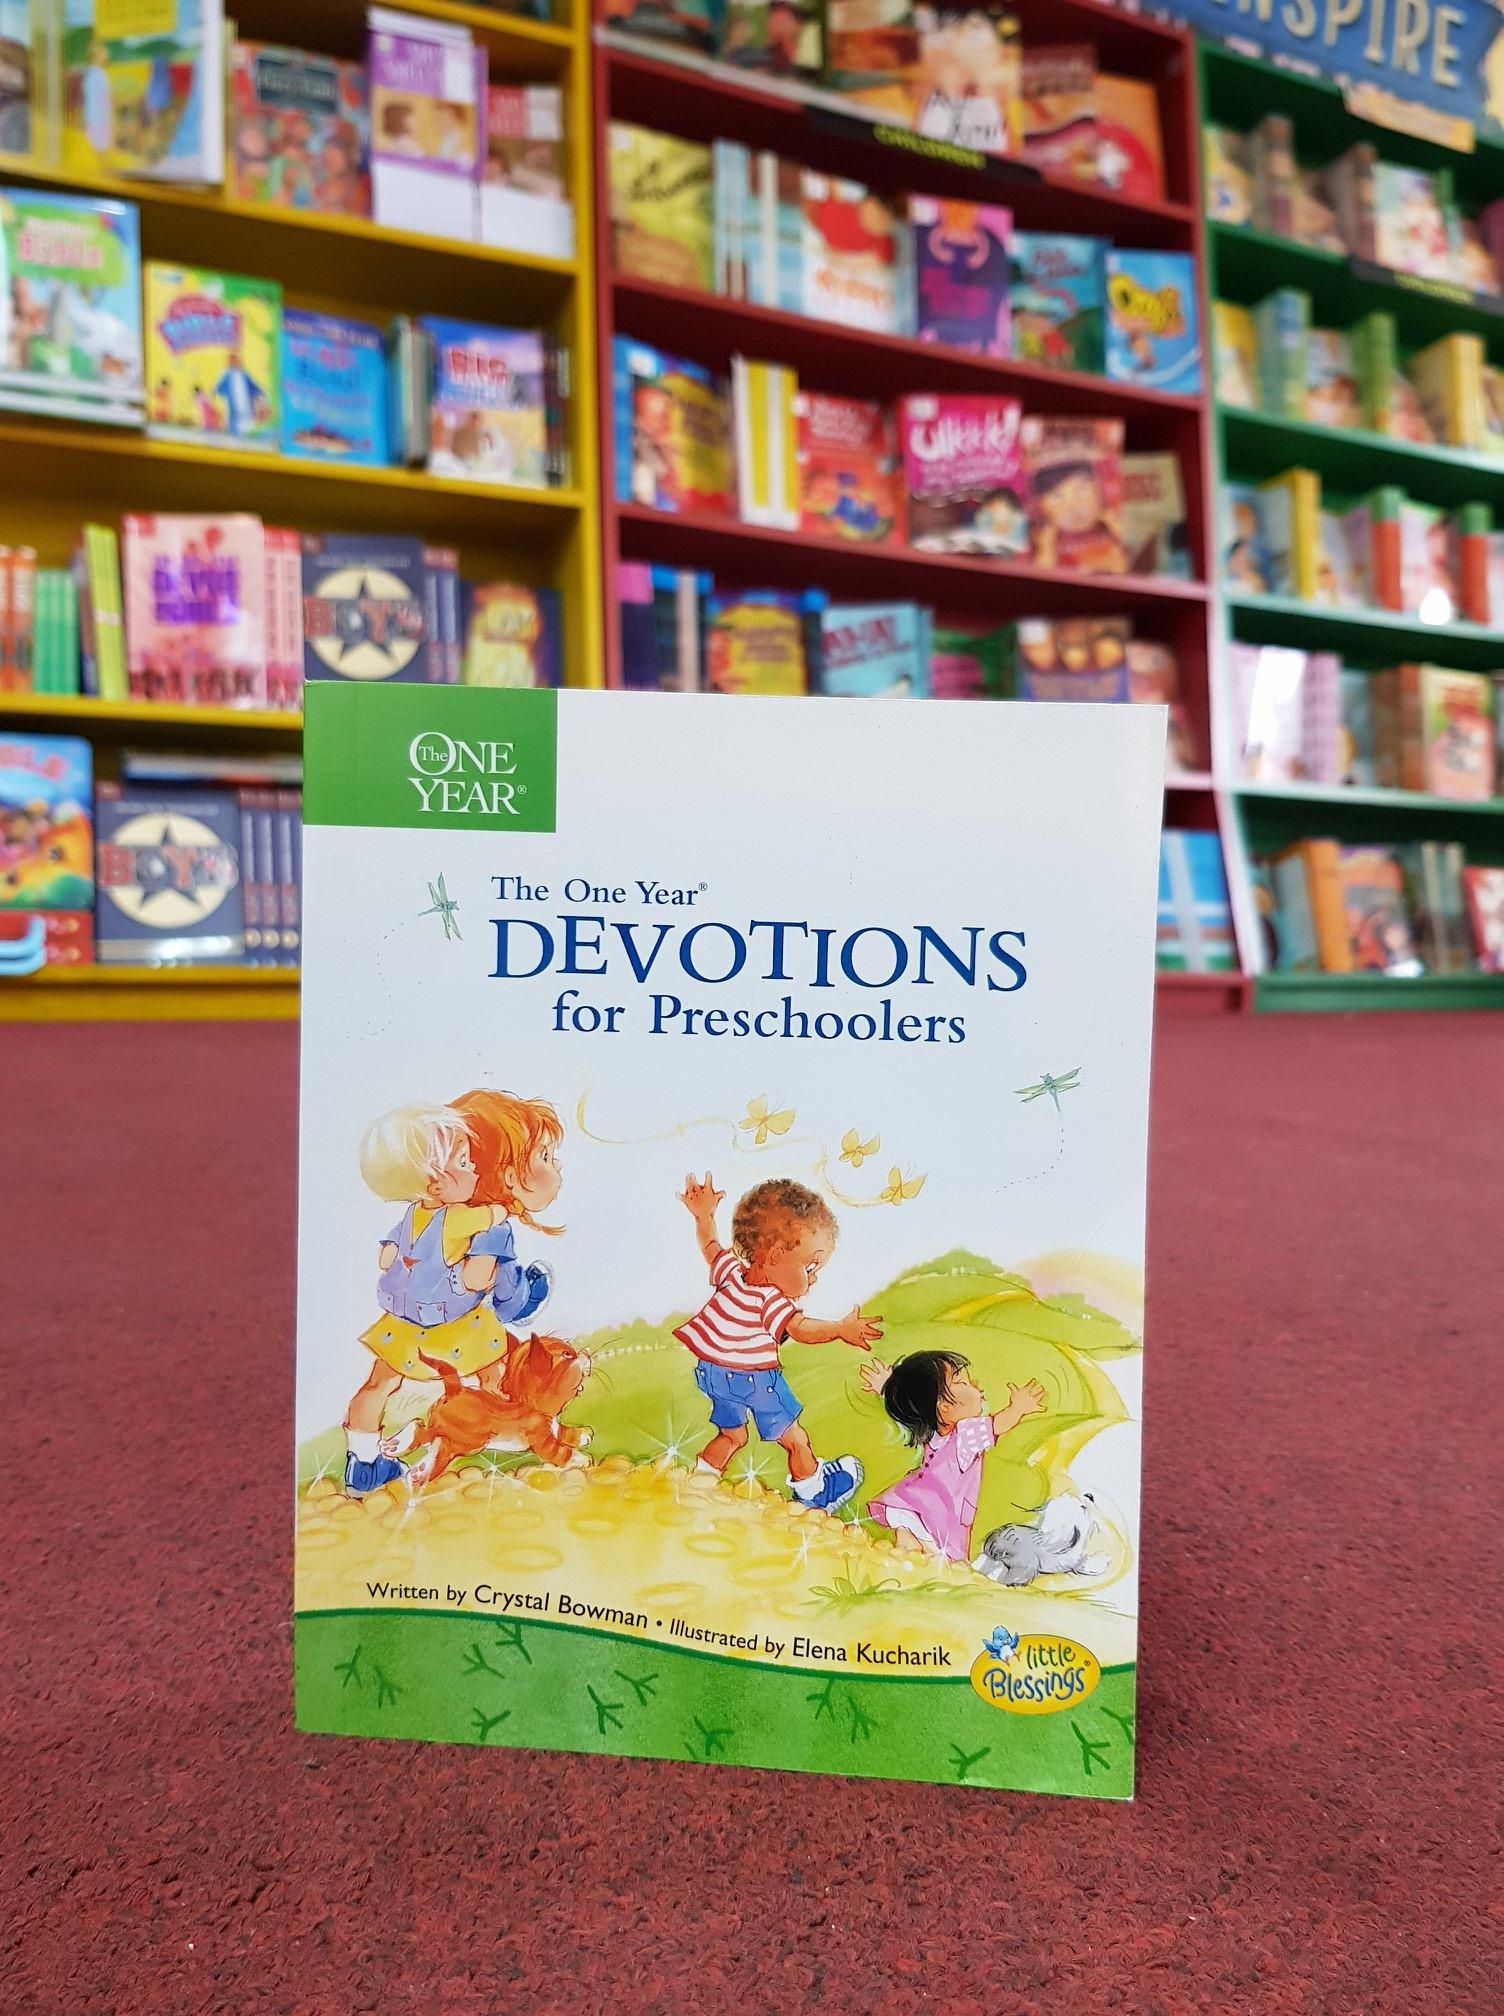 one year devotions for preschoolers .jpg